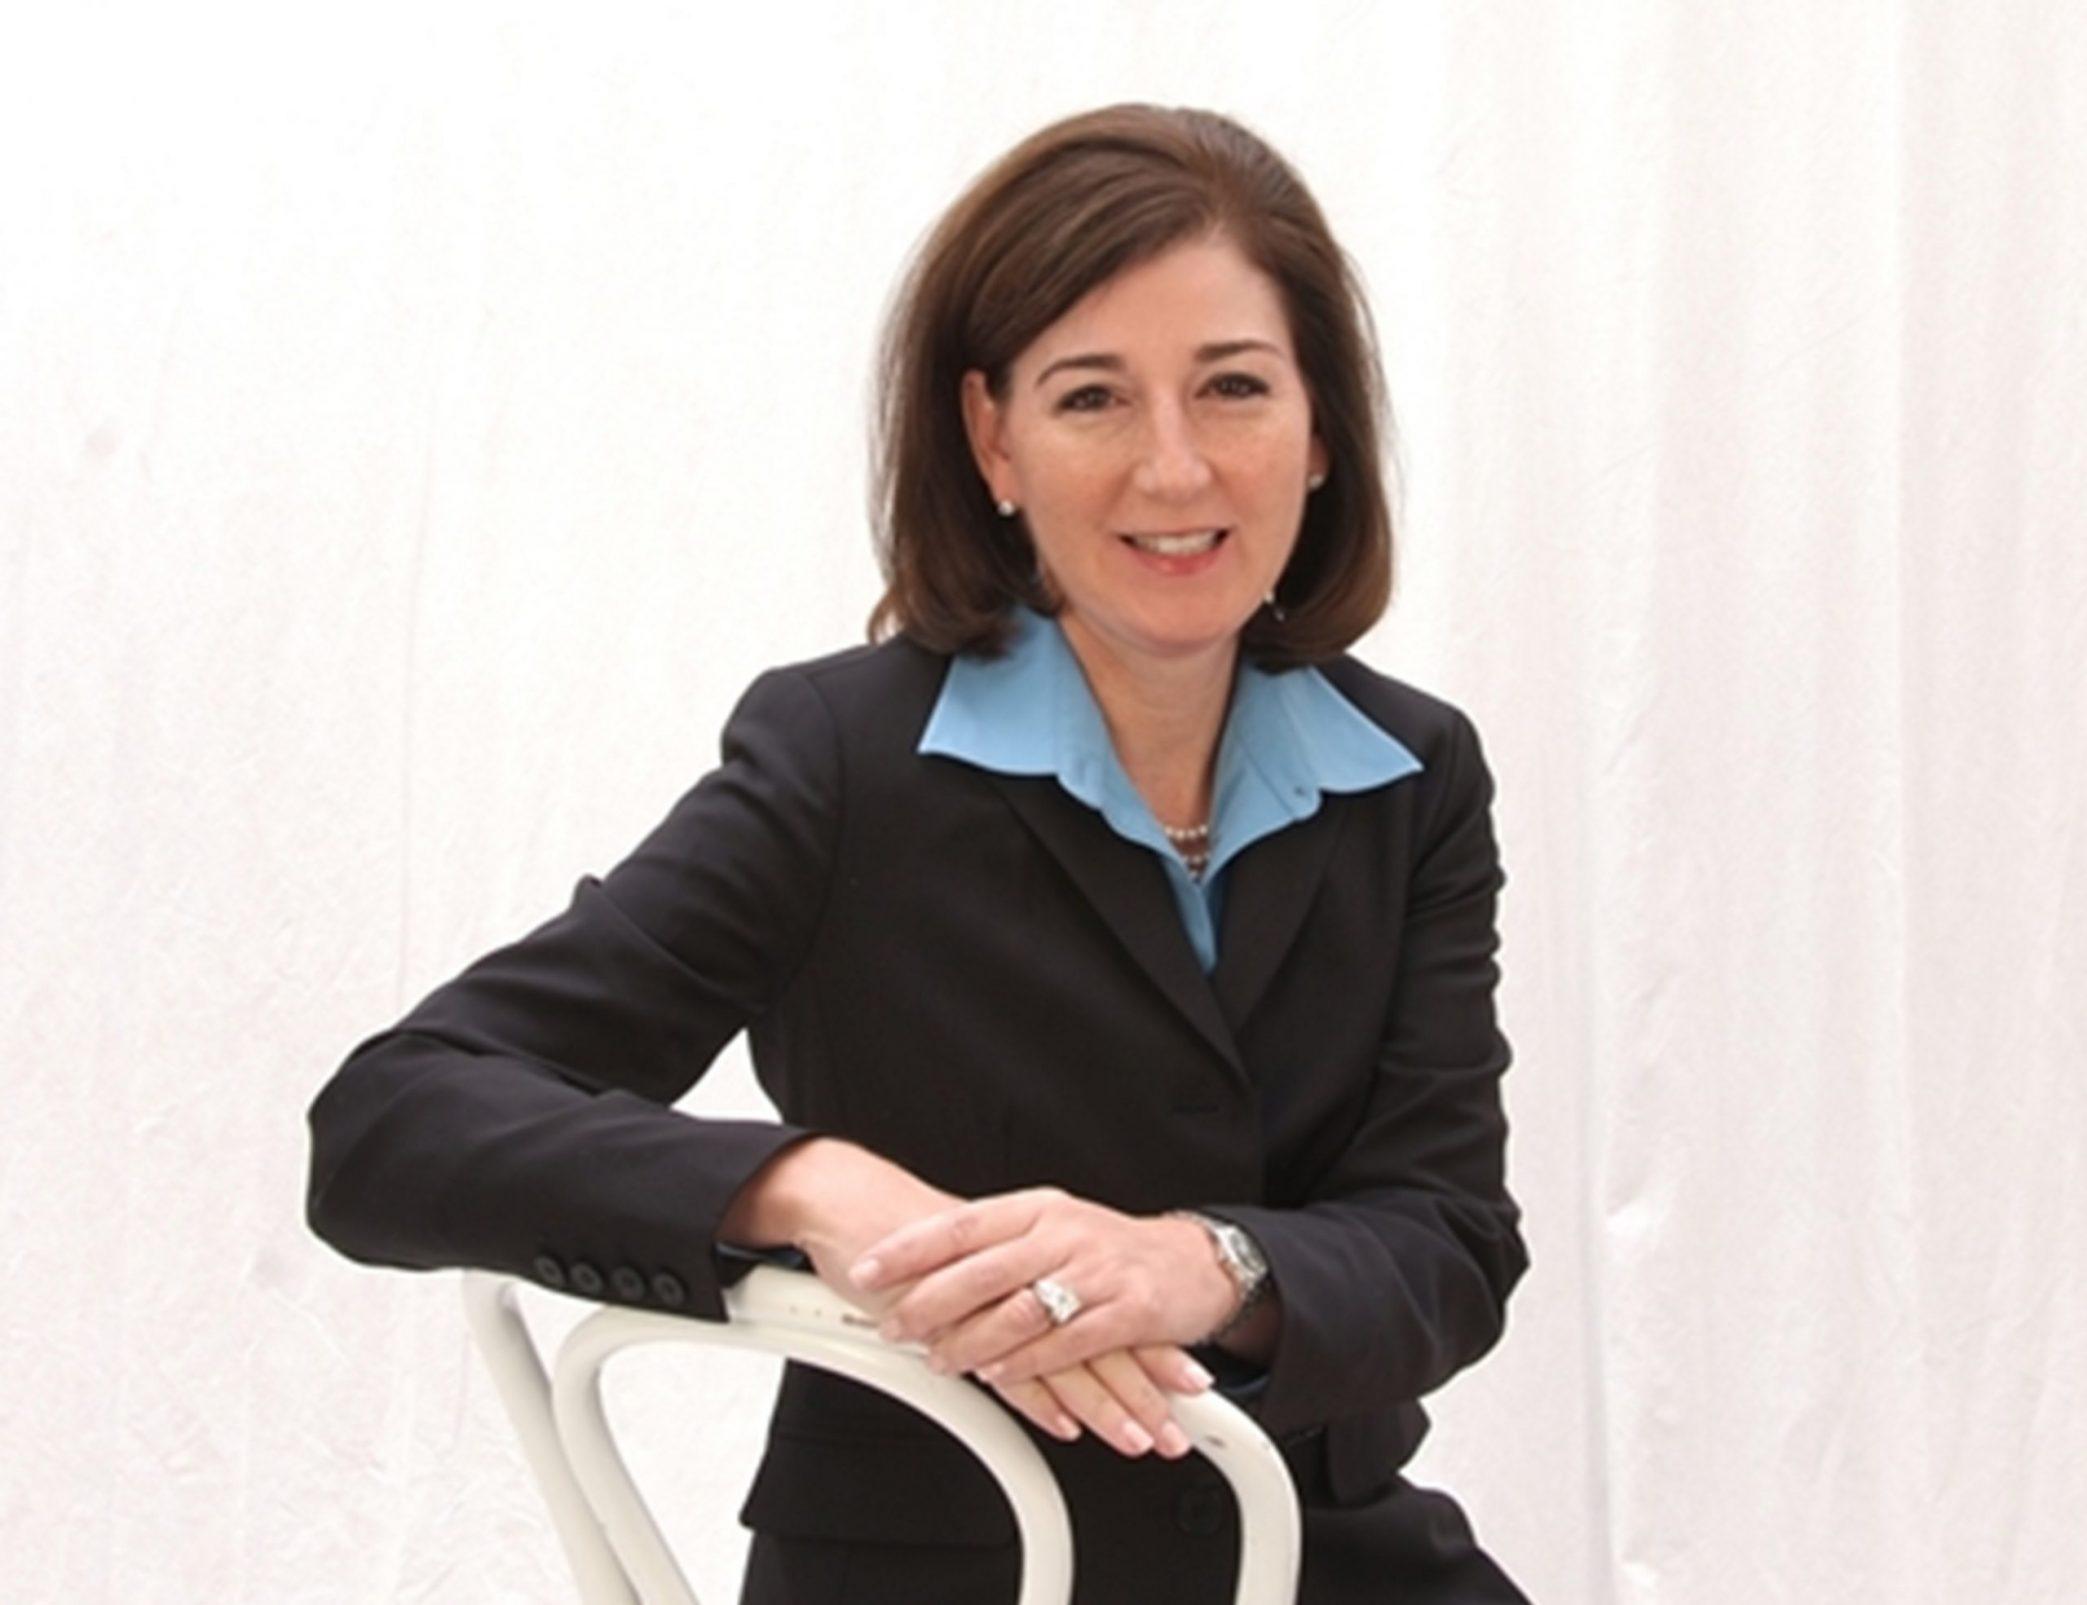 Kathy Federico